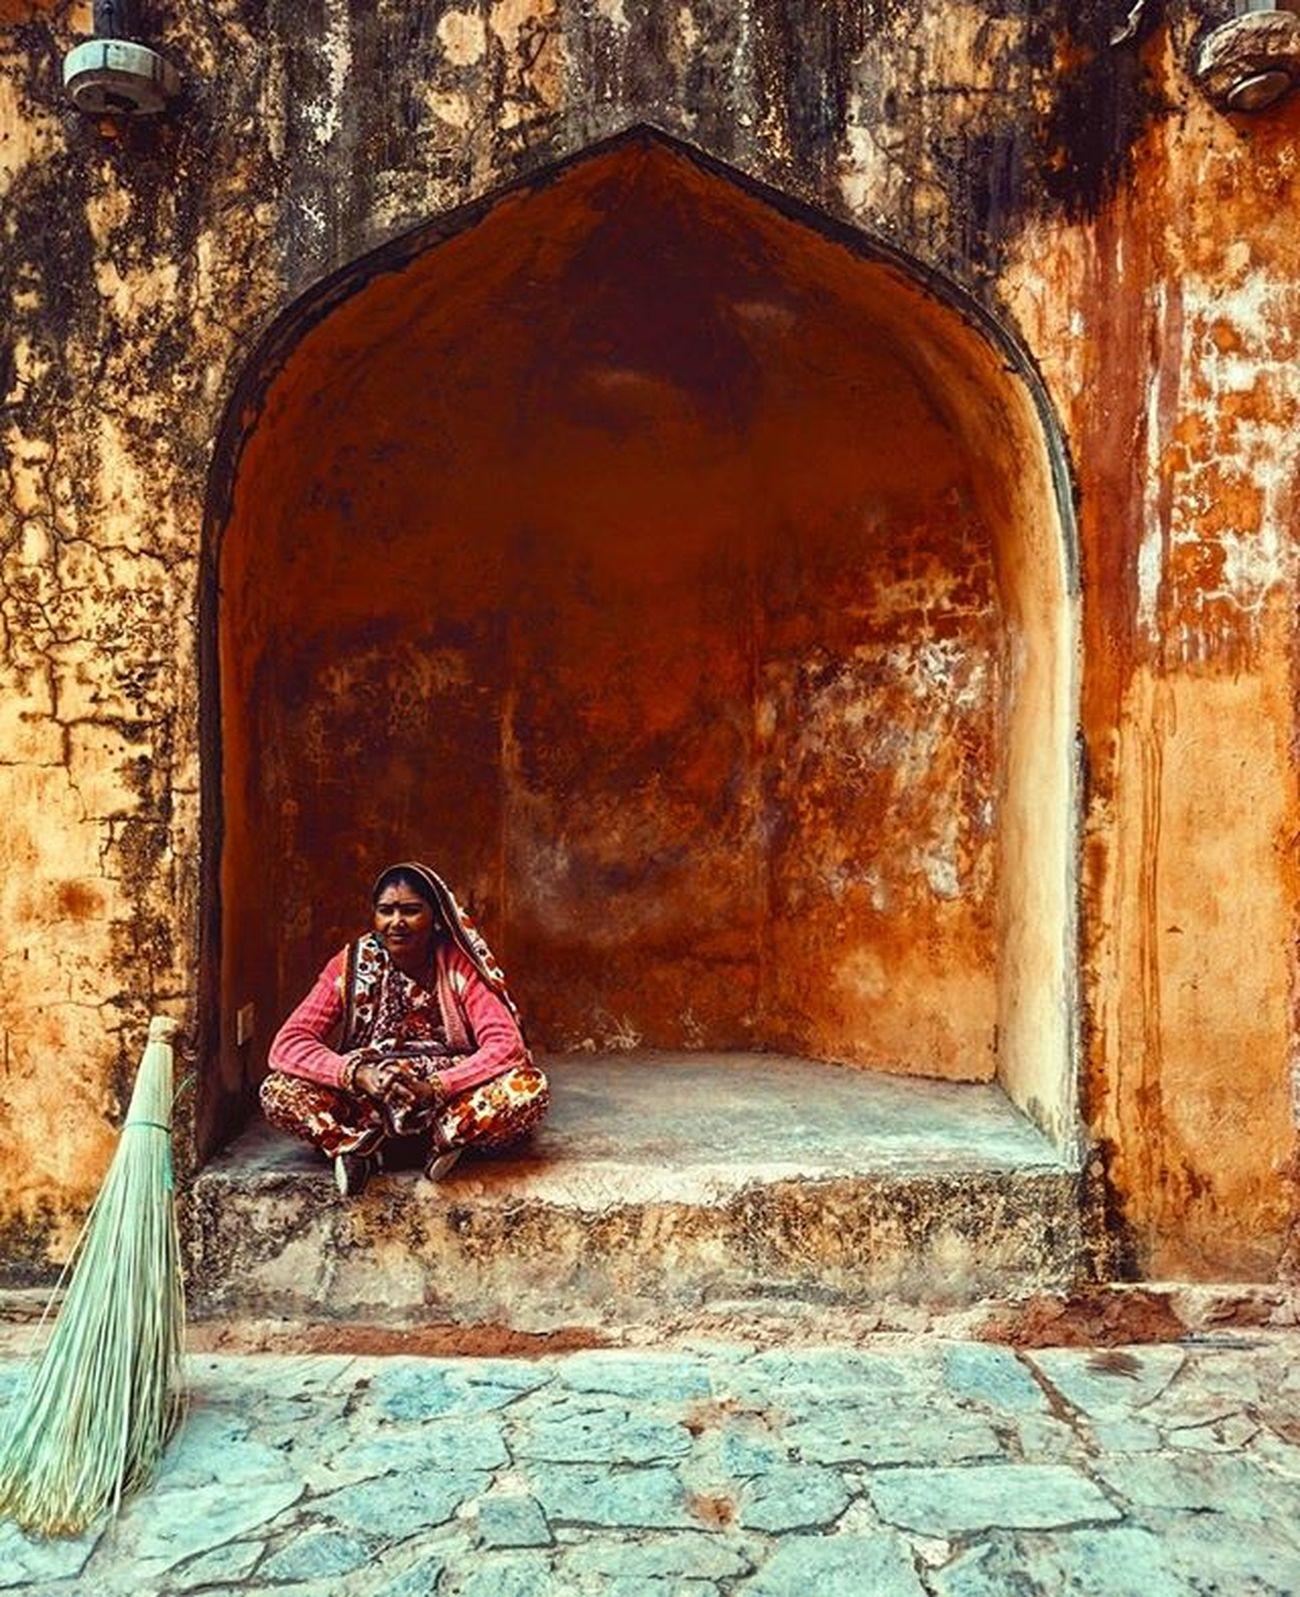 Breaktime. Emberfort India Jaipur Kingpalace Rajshtan Travelphotography Travel Traveler Breaktime Instagram Beautifuljaipur Instadaily Rarecation